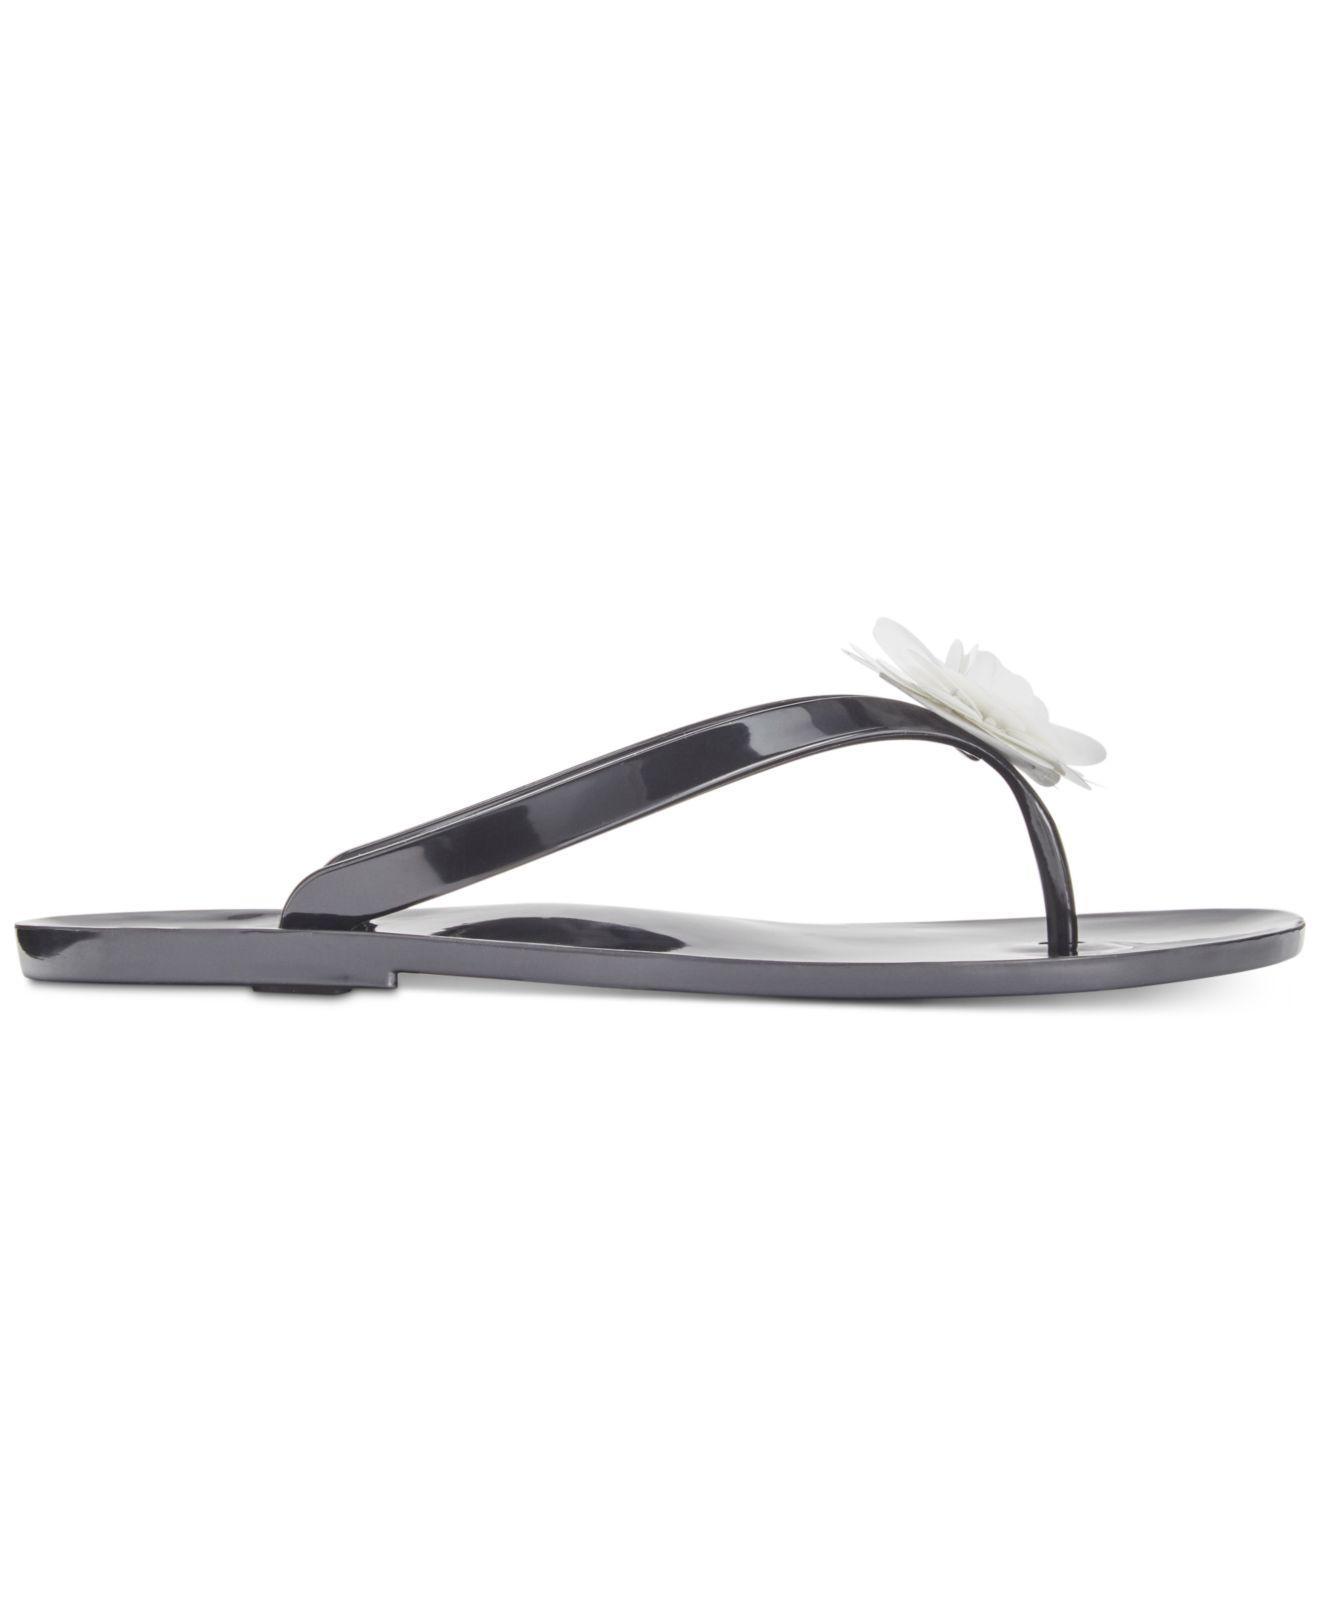 c06fce43ab12 Lyst - Kate Spade Fiorina Jelly Flip Flops in Black